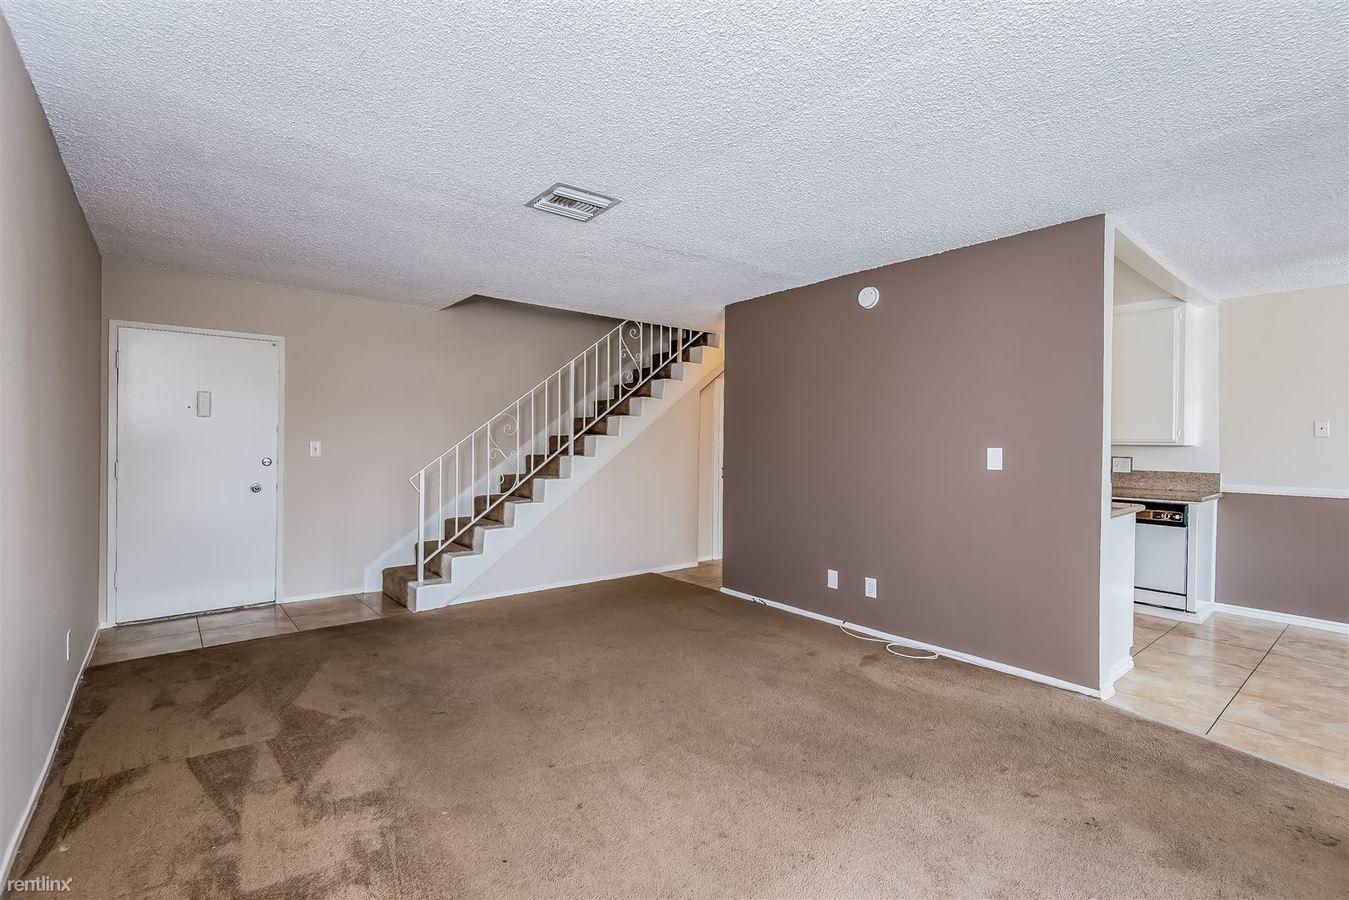 2 Bedrooms 2 Bathrooms Apartment for rent at Royal Oaks in San Gabriel, CA